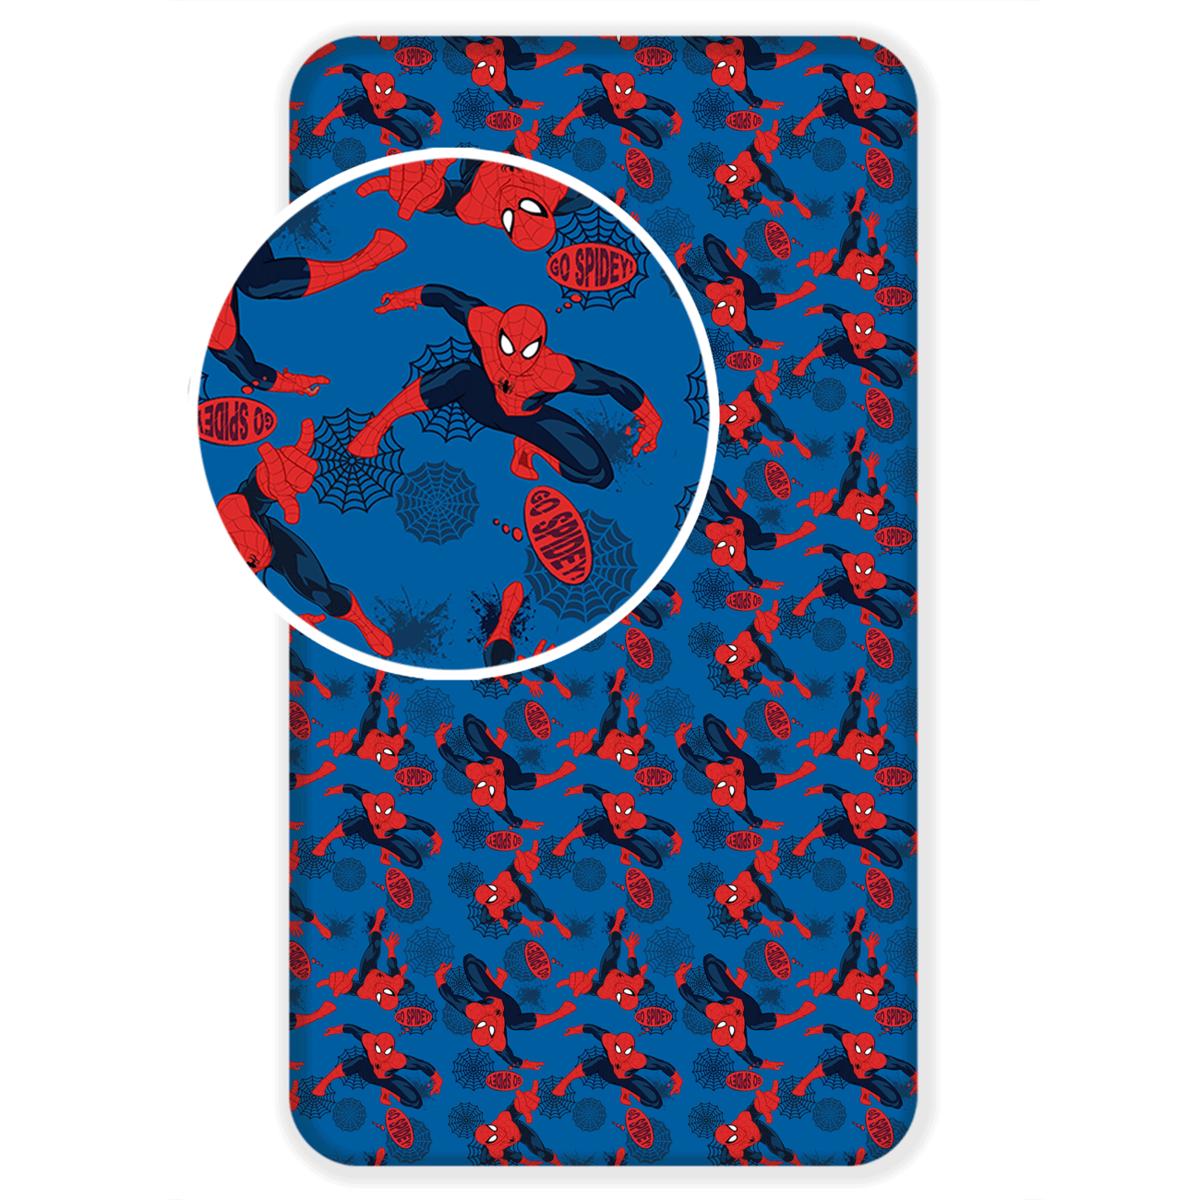 Jerry Fabrics Detské bavlnené prestieradlo Spiderman 2017, 90 x 200 cm